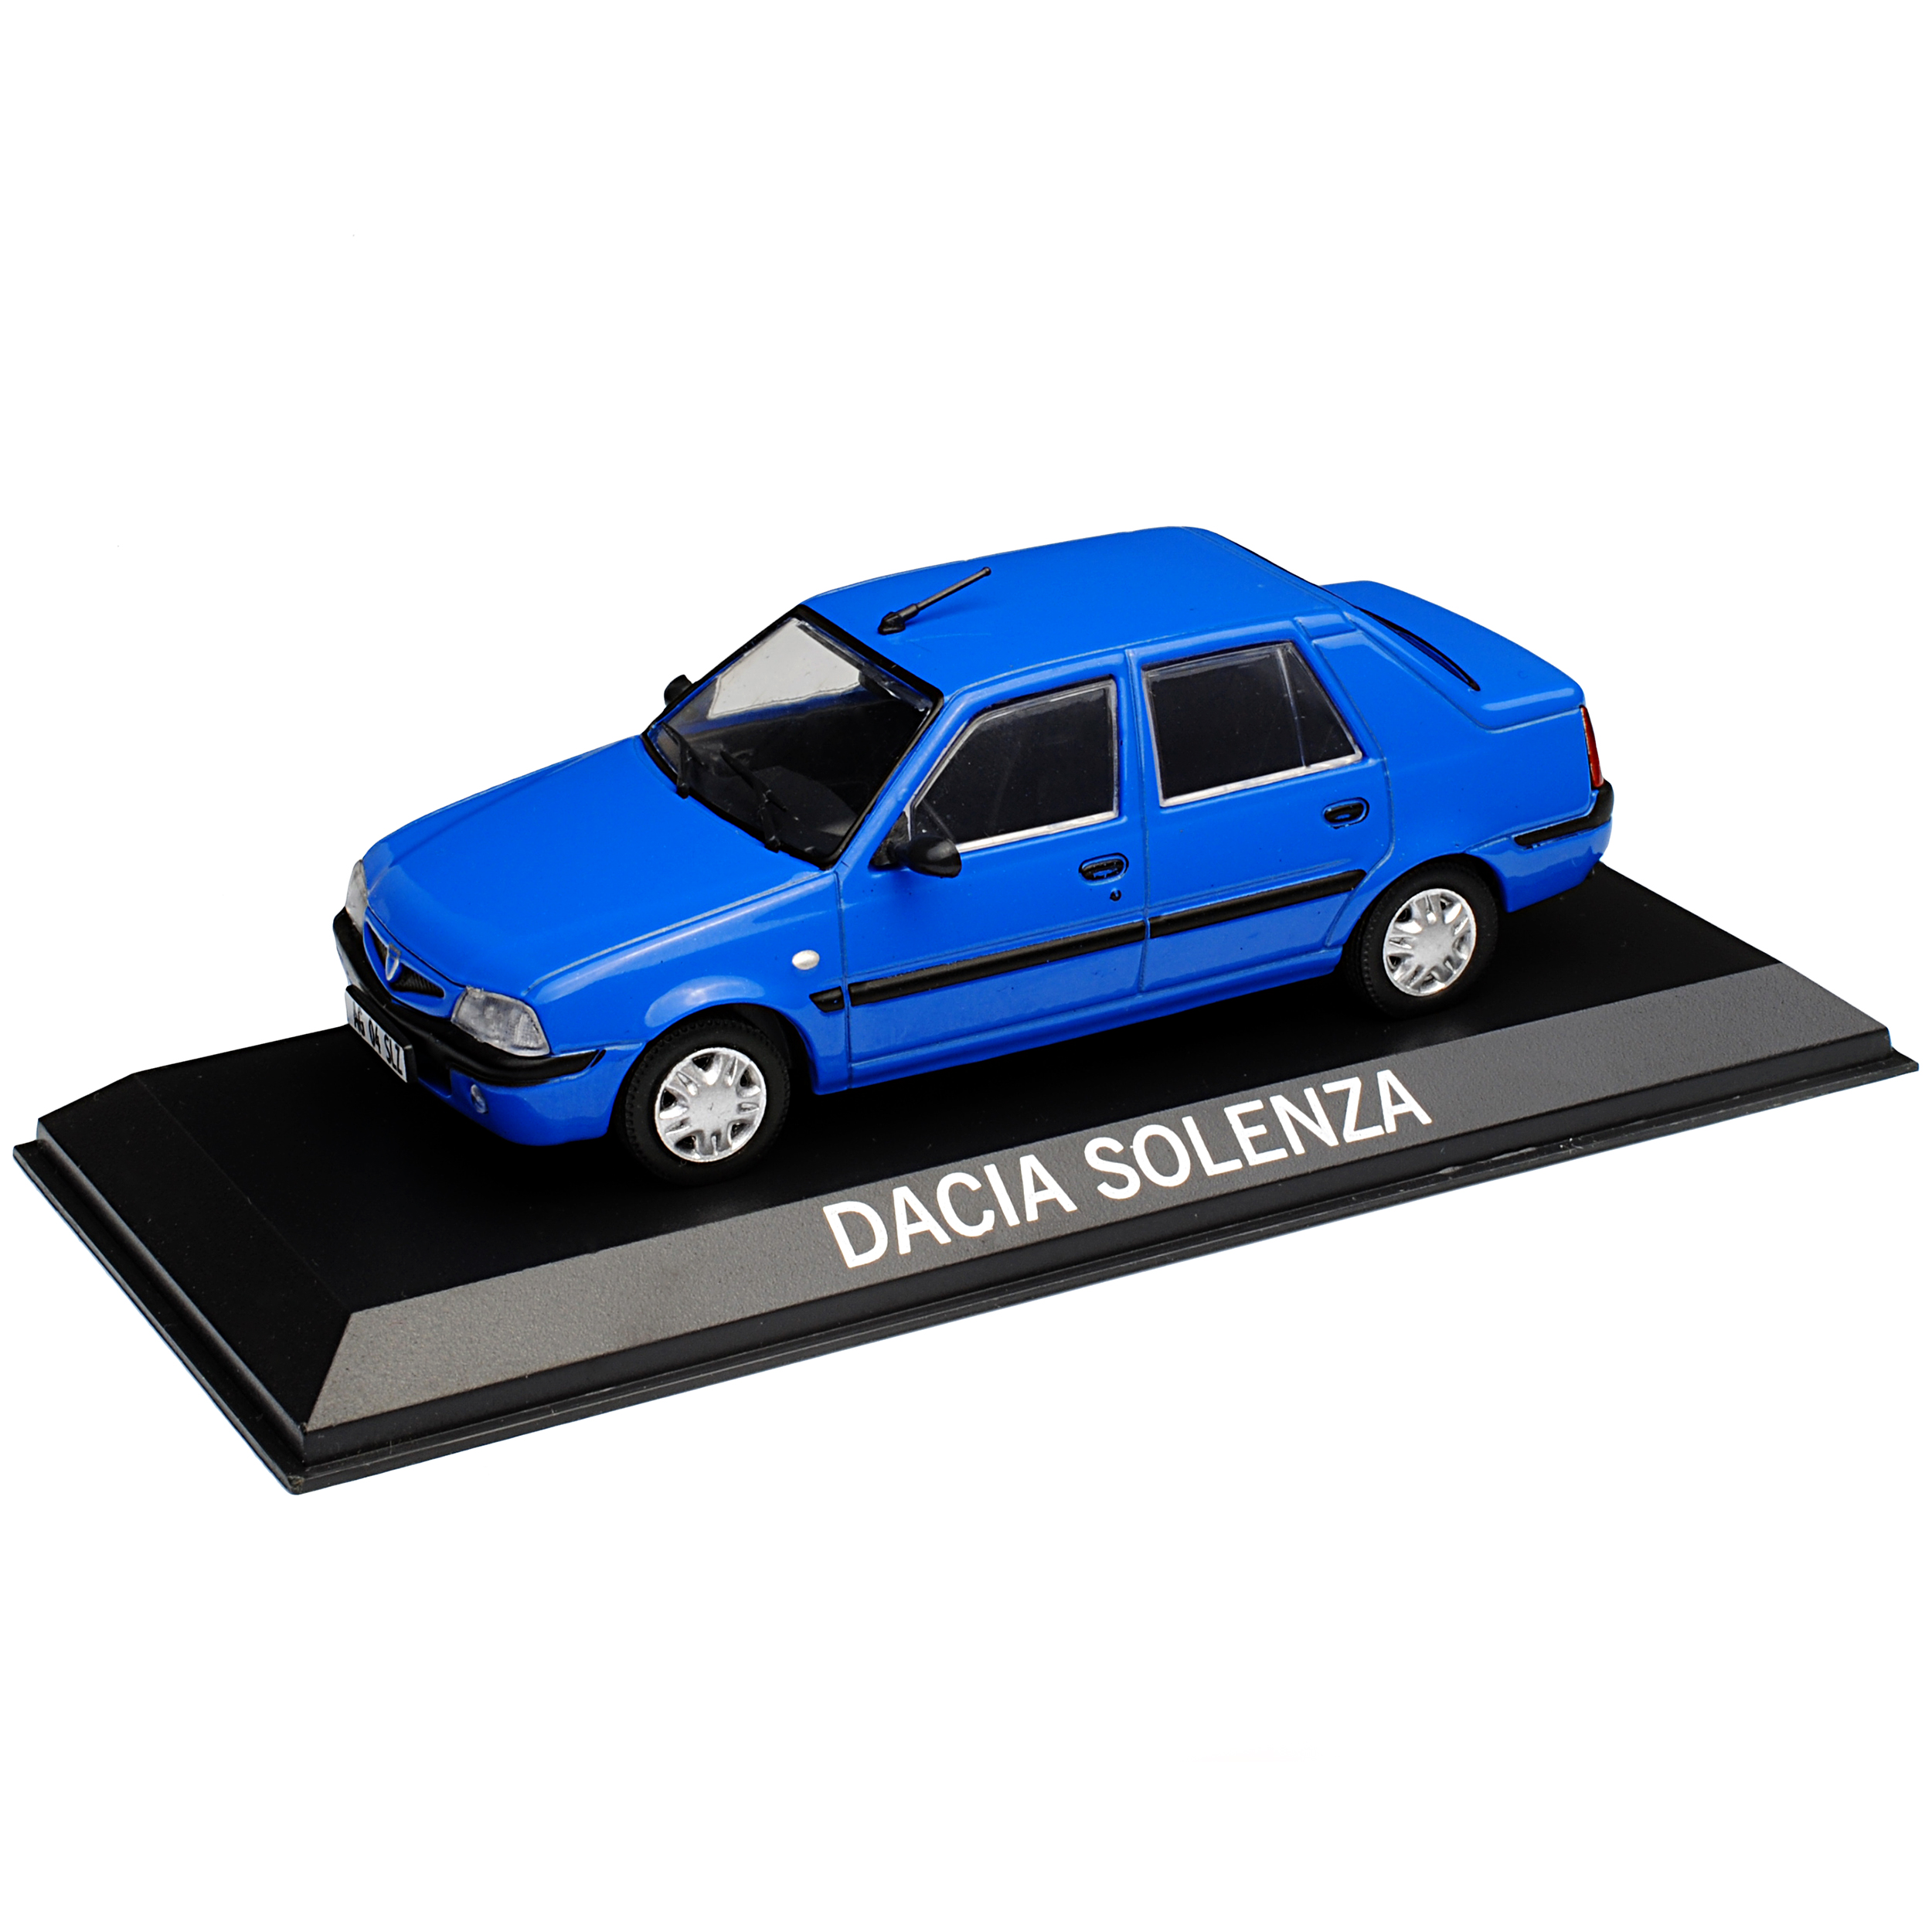 Dacia Solenza Limousine Blau 2003-2005 mit Sockel 1//43 Modellcarsonline Modell..